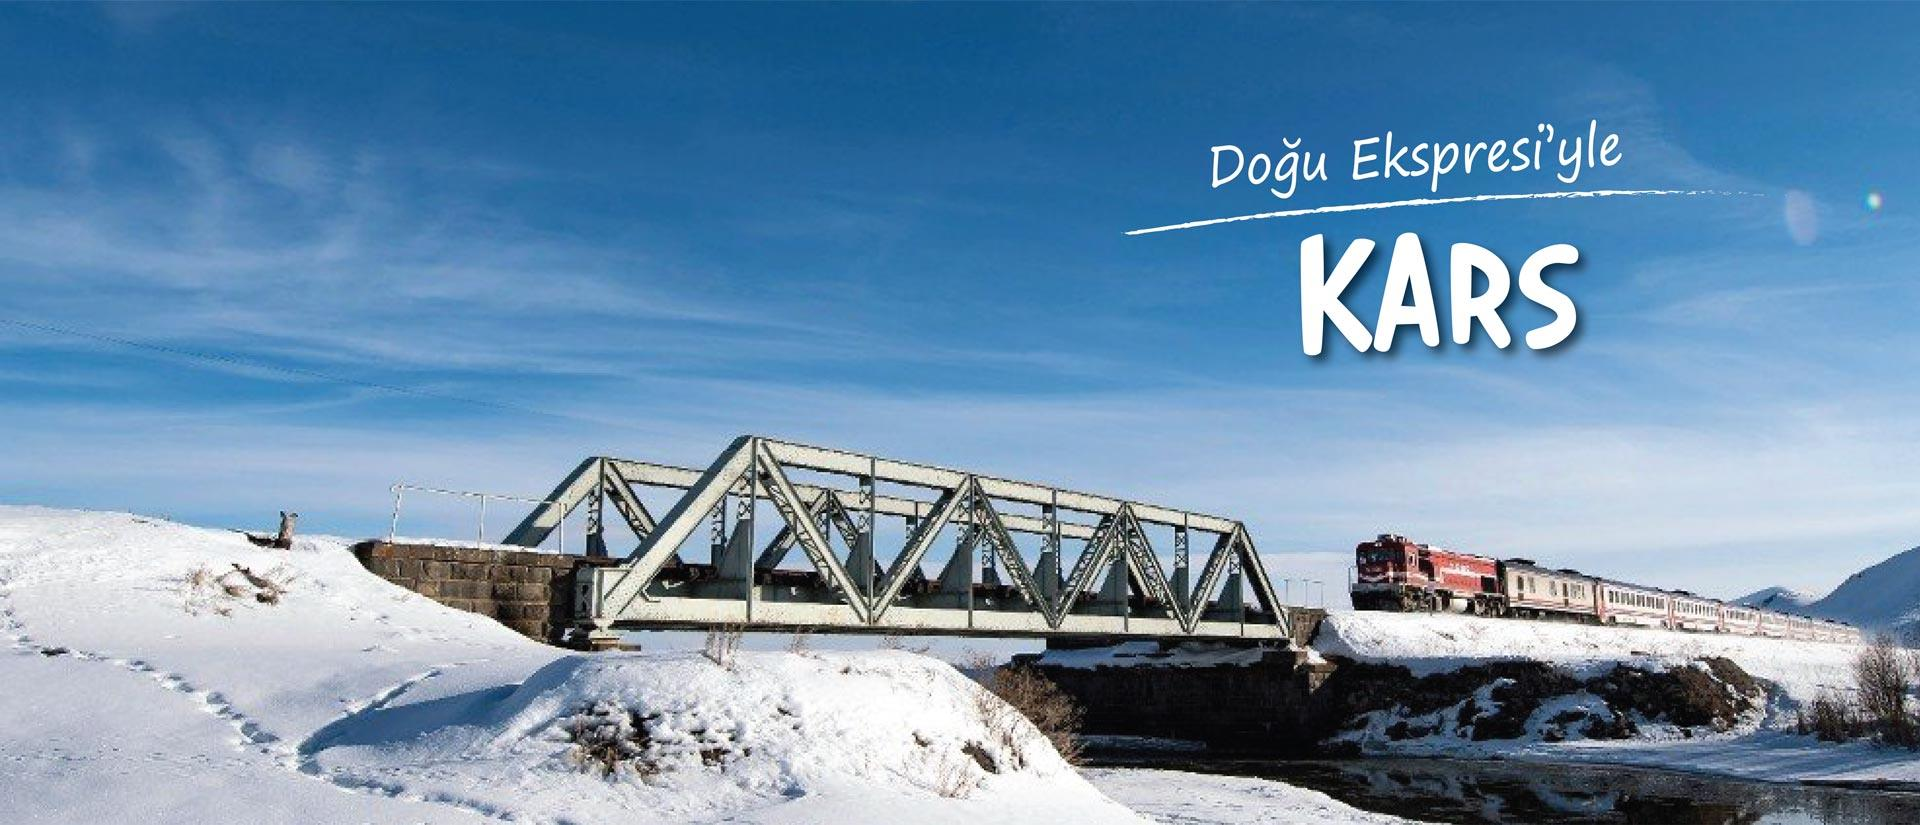 Dogu_ekspresi_kars